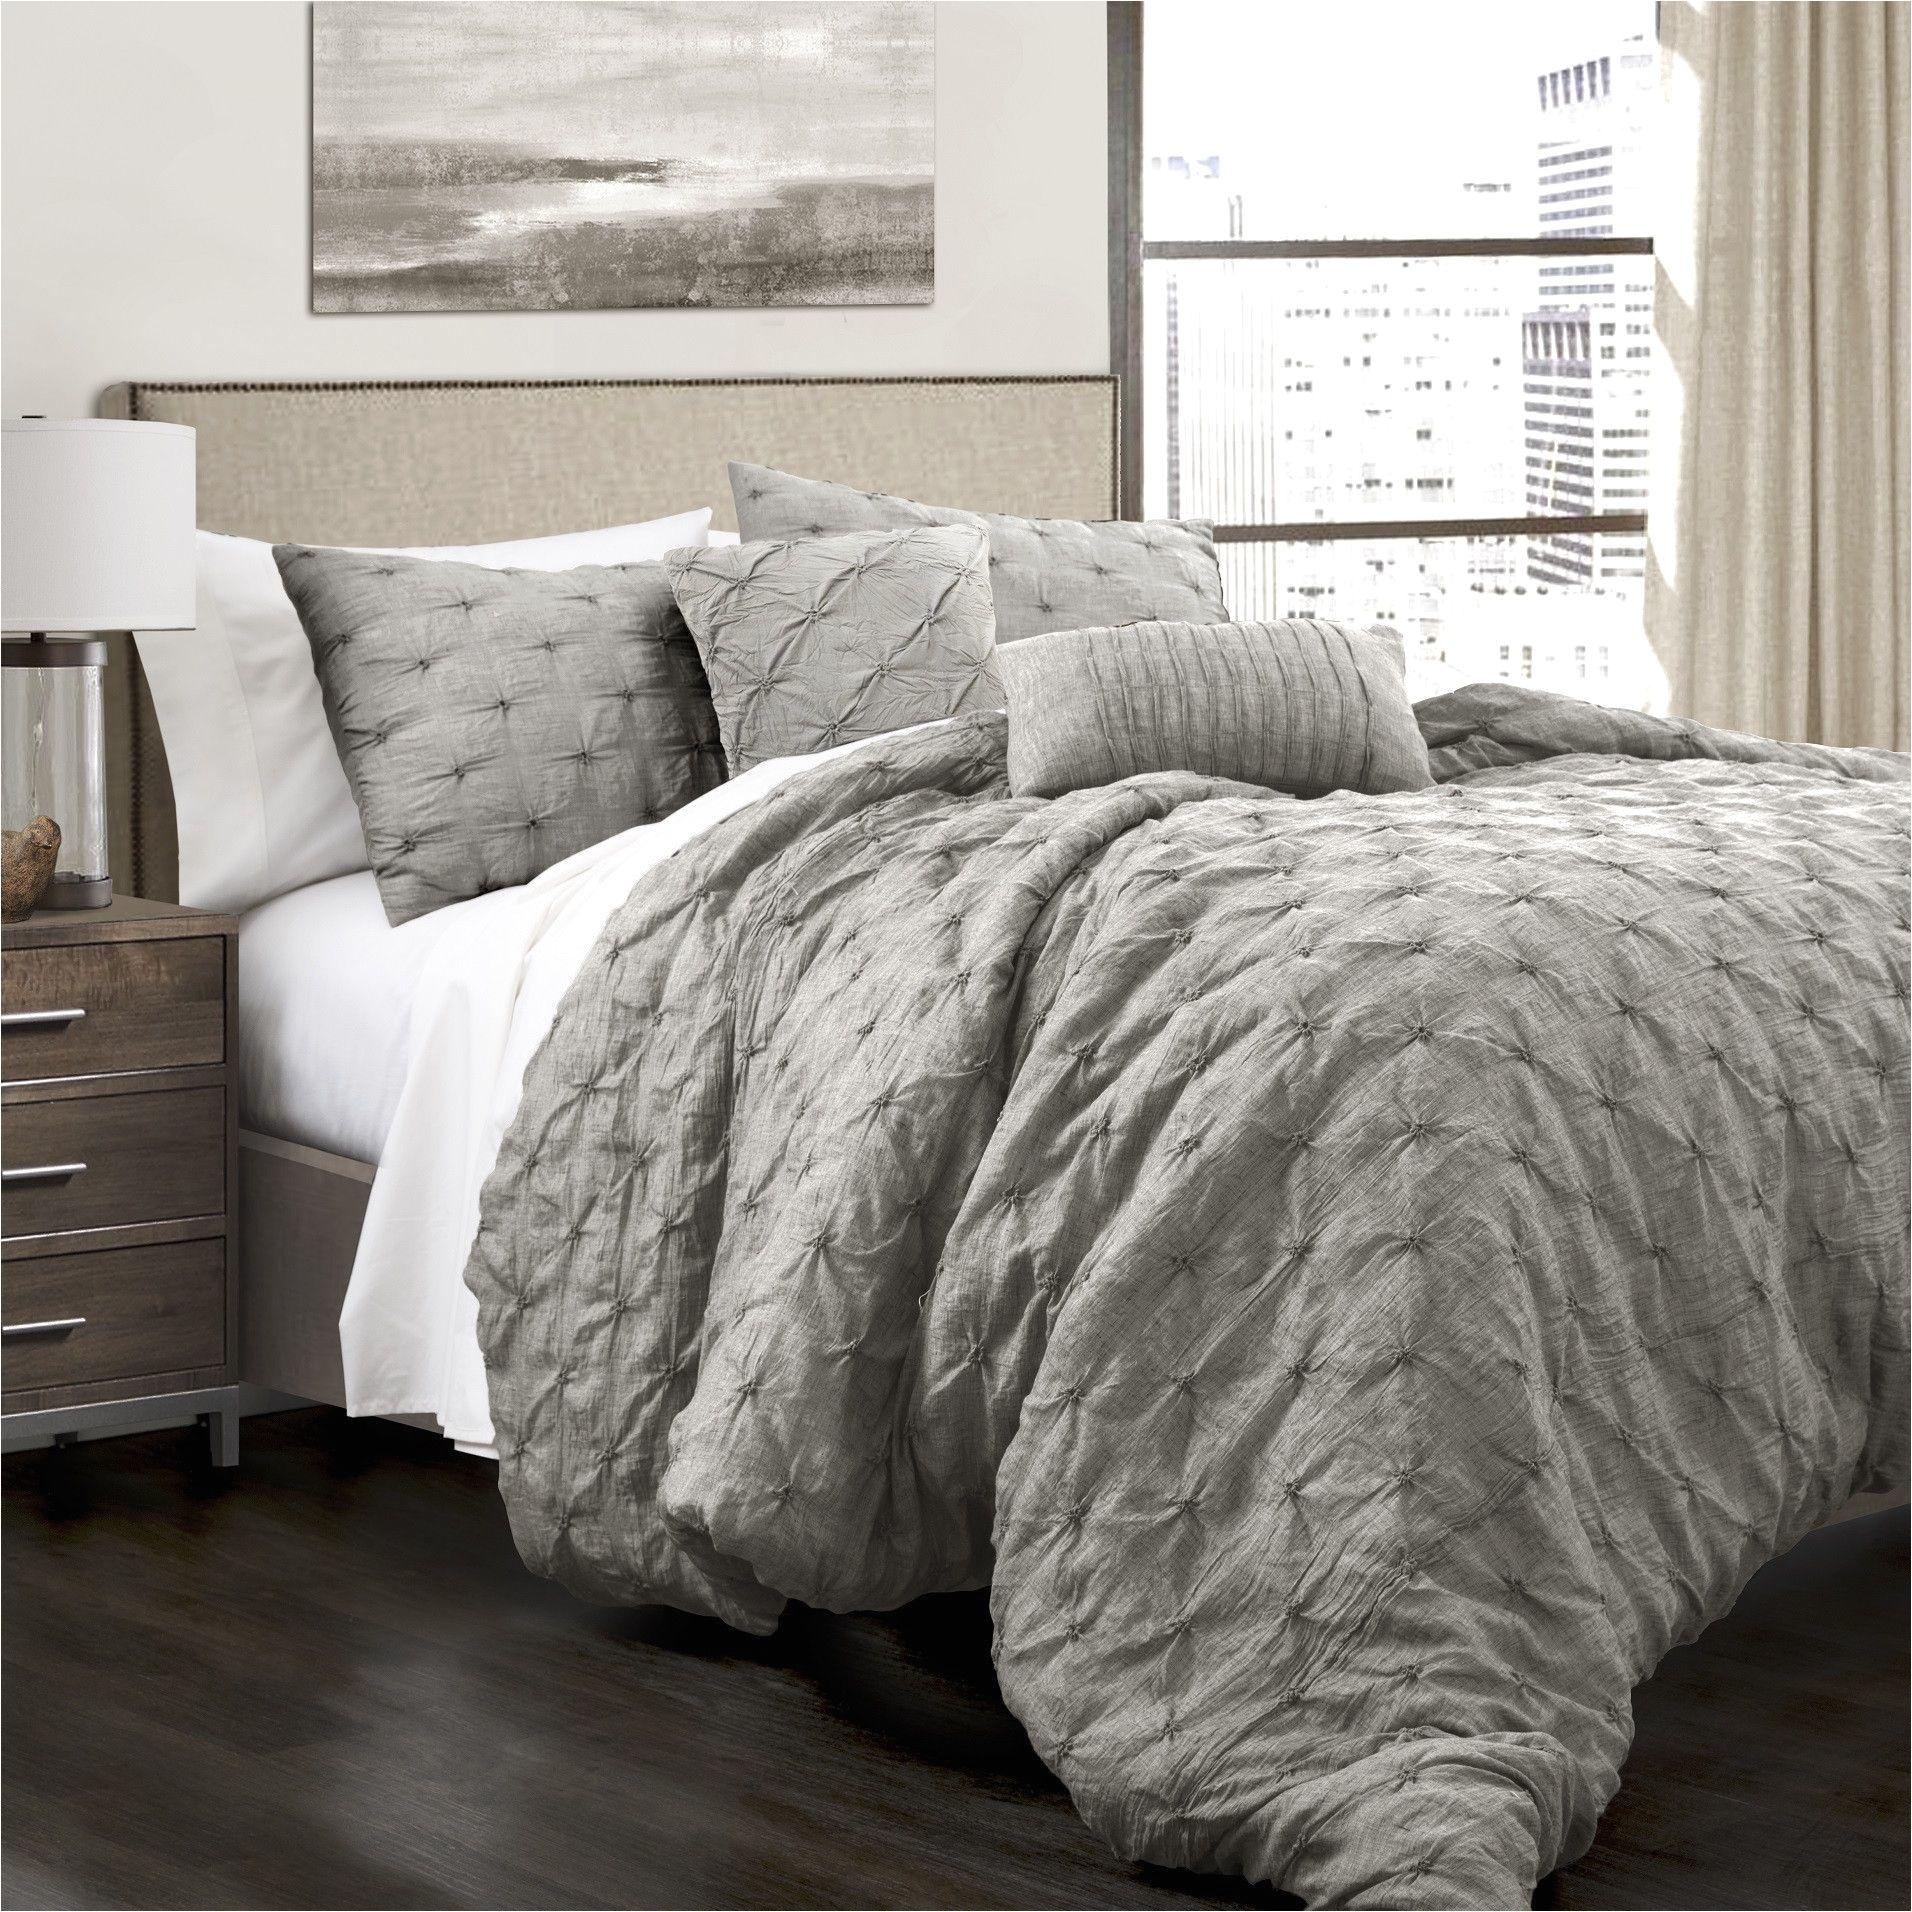 Lush Decor Belle 4 Piece Comforter Set White